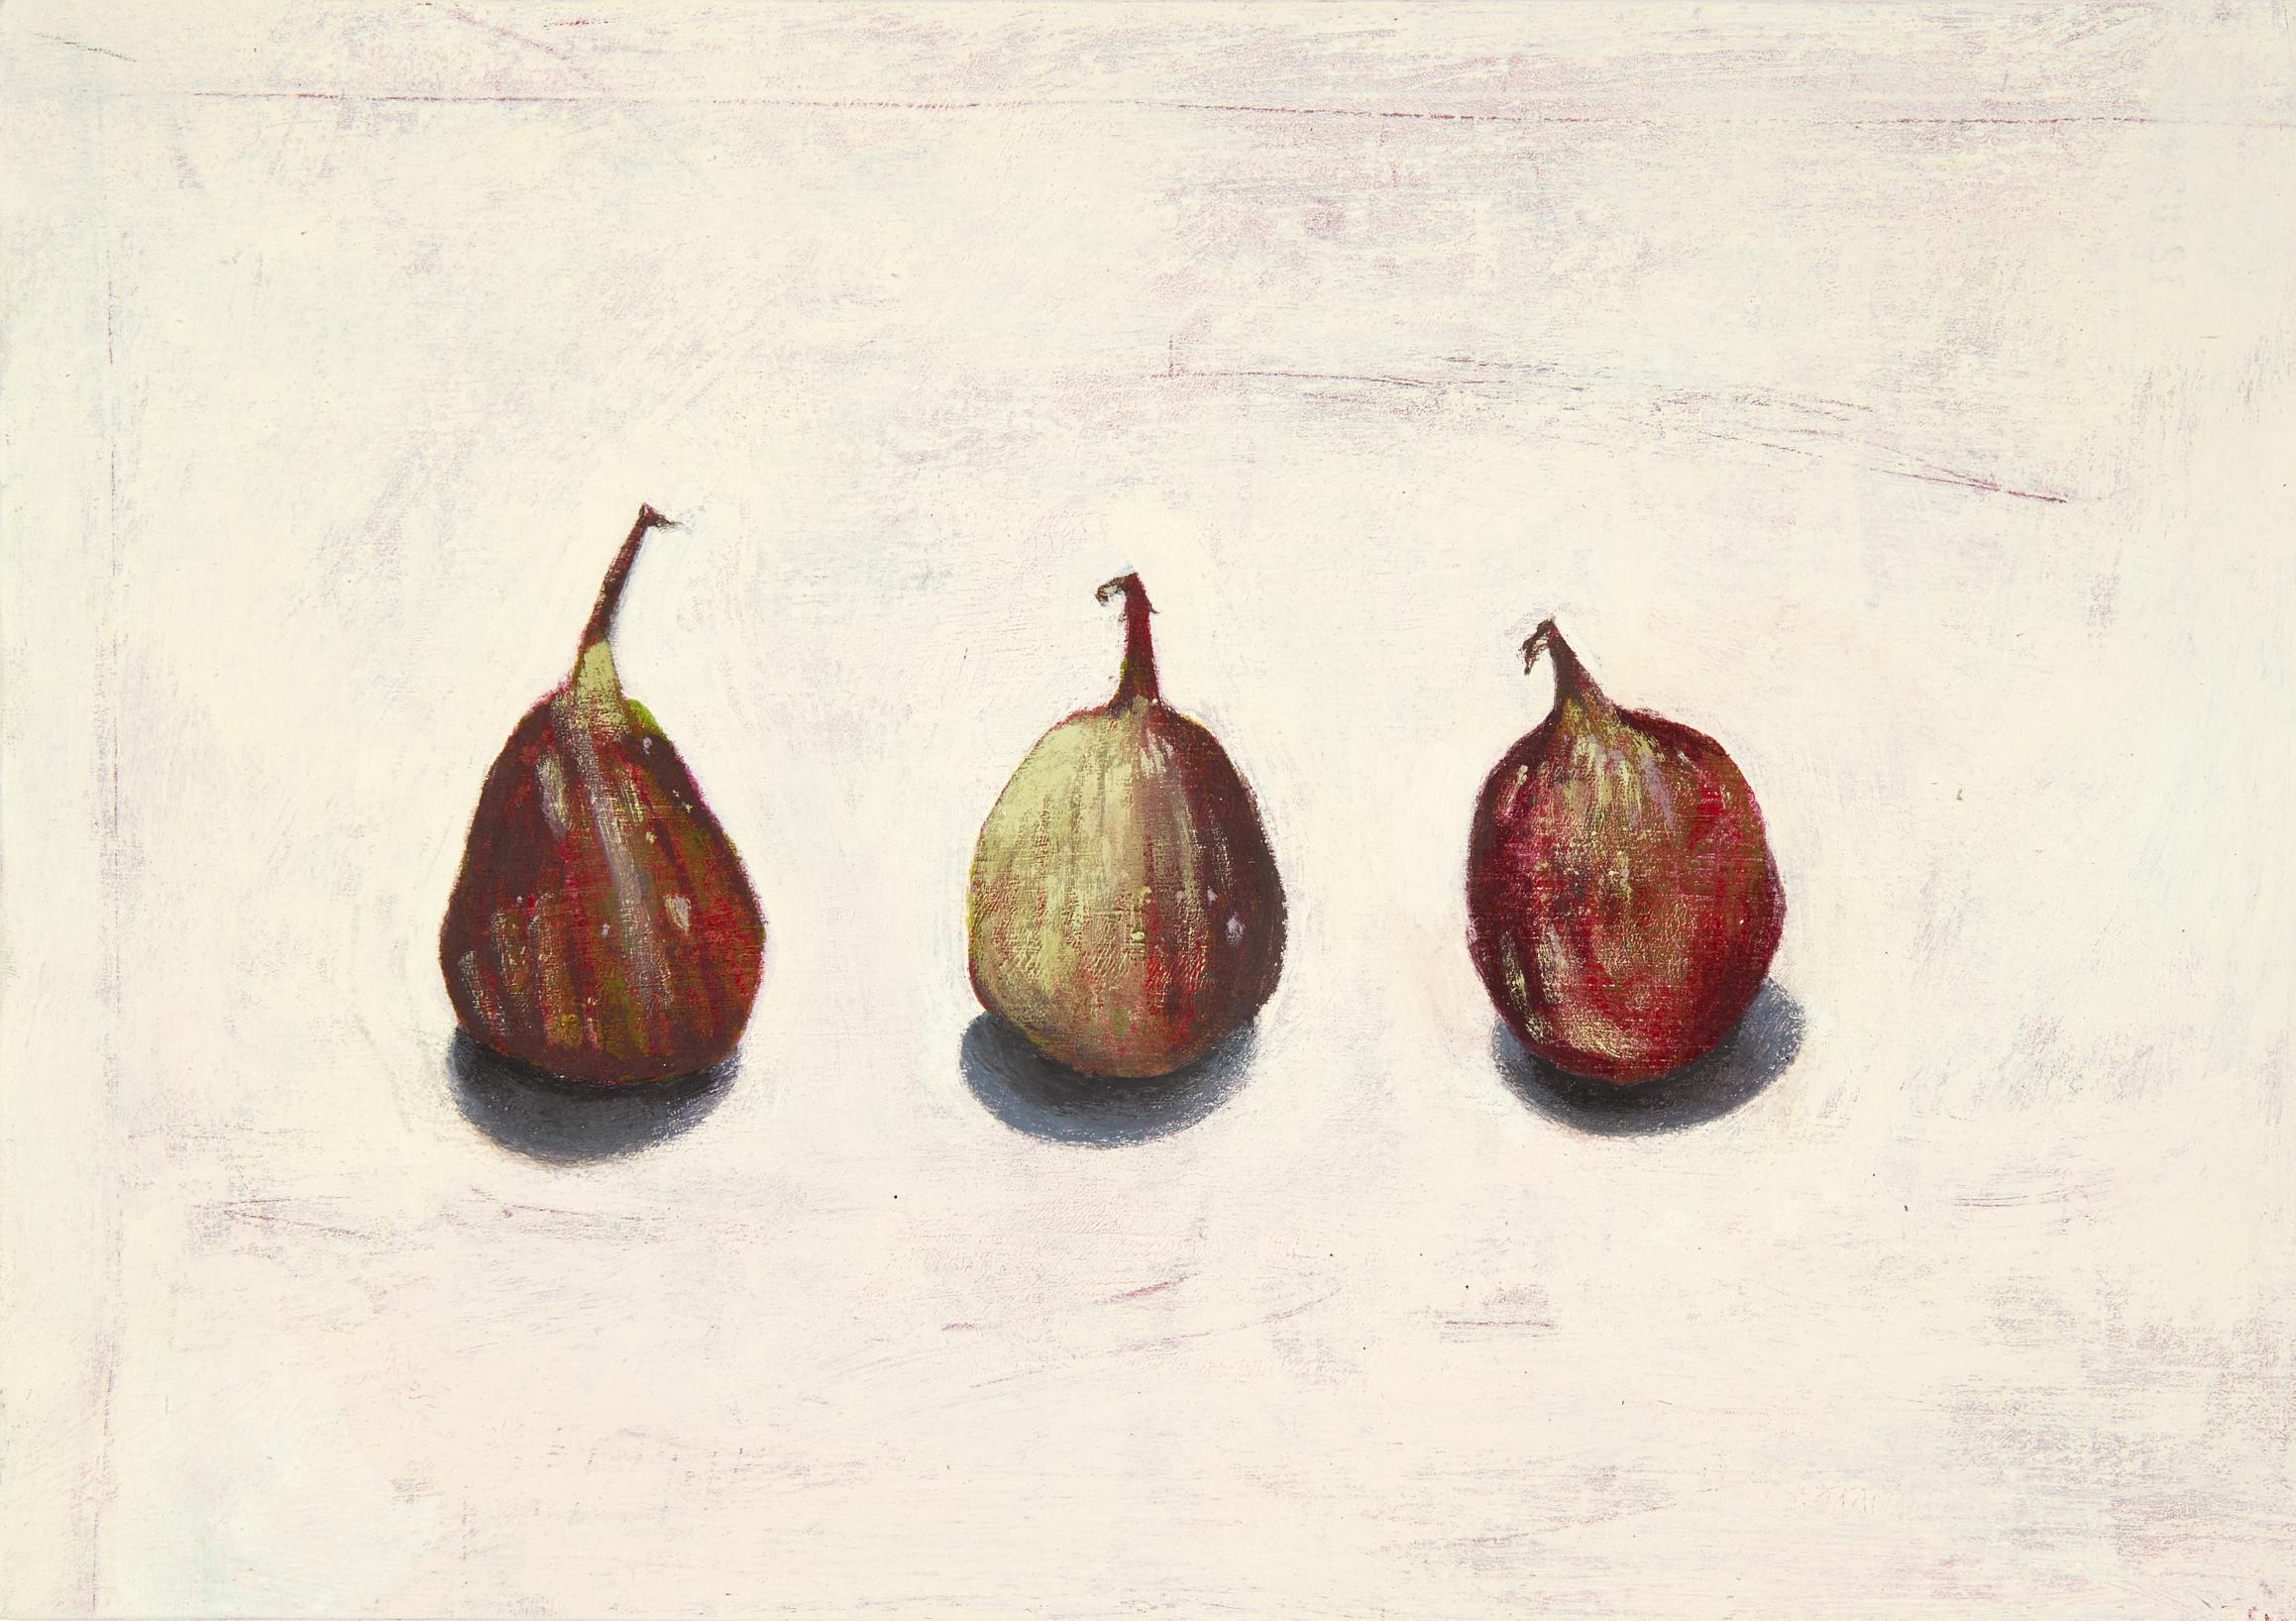 Three Over-ripe Figs - Acrylic on board